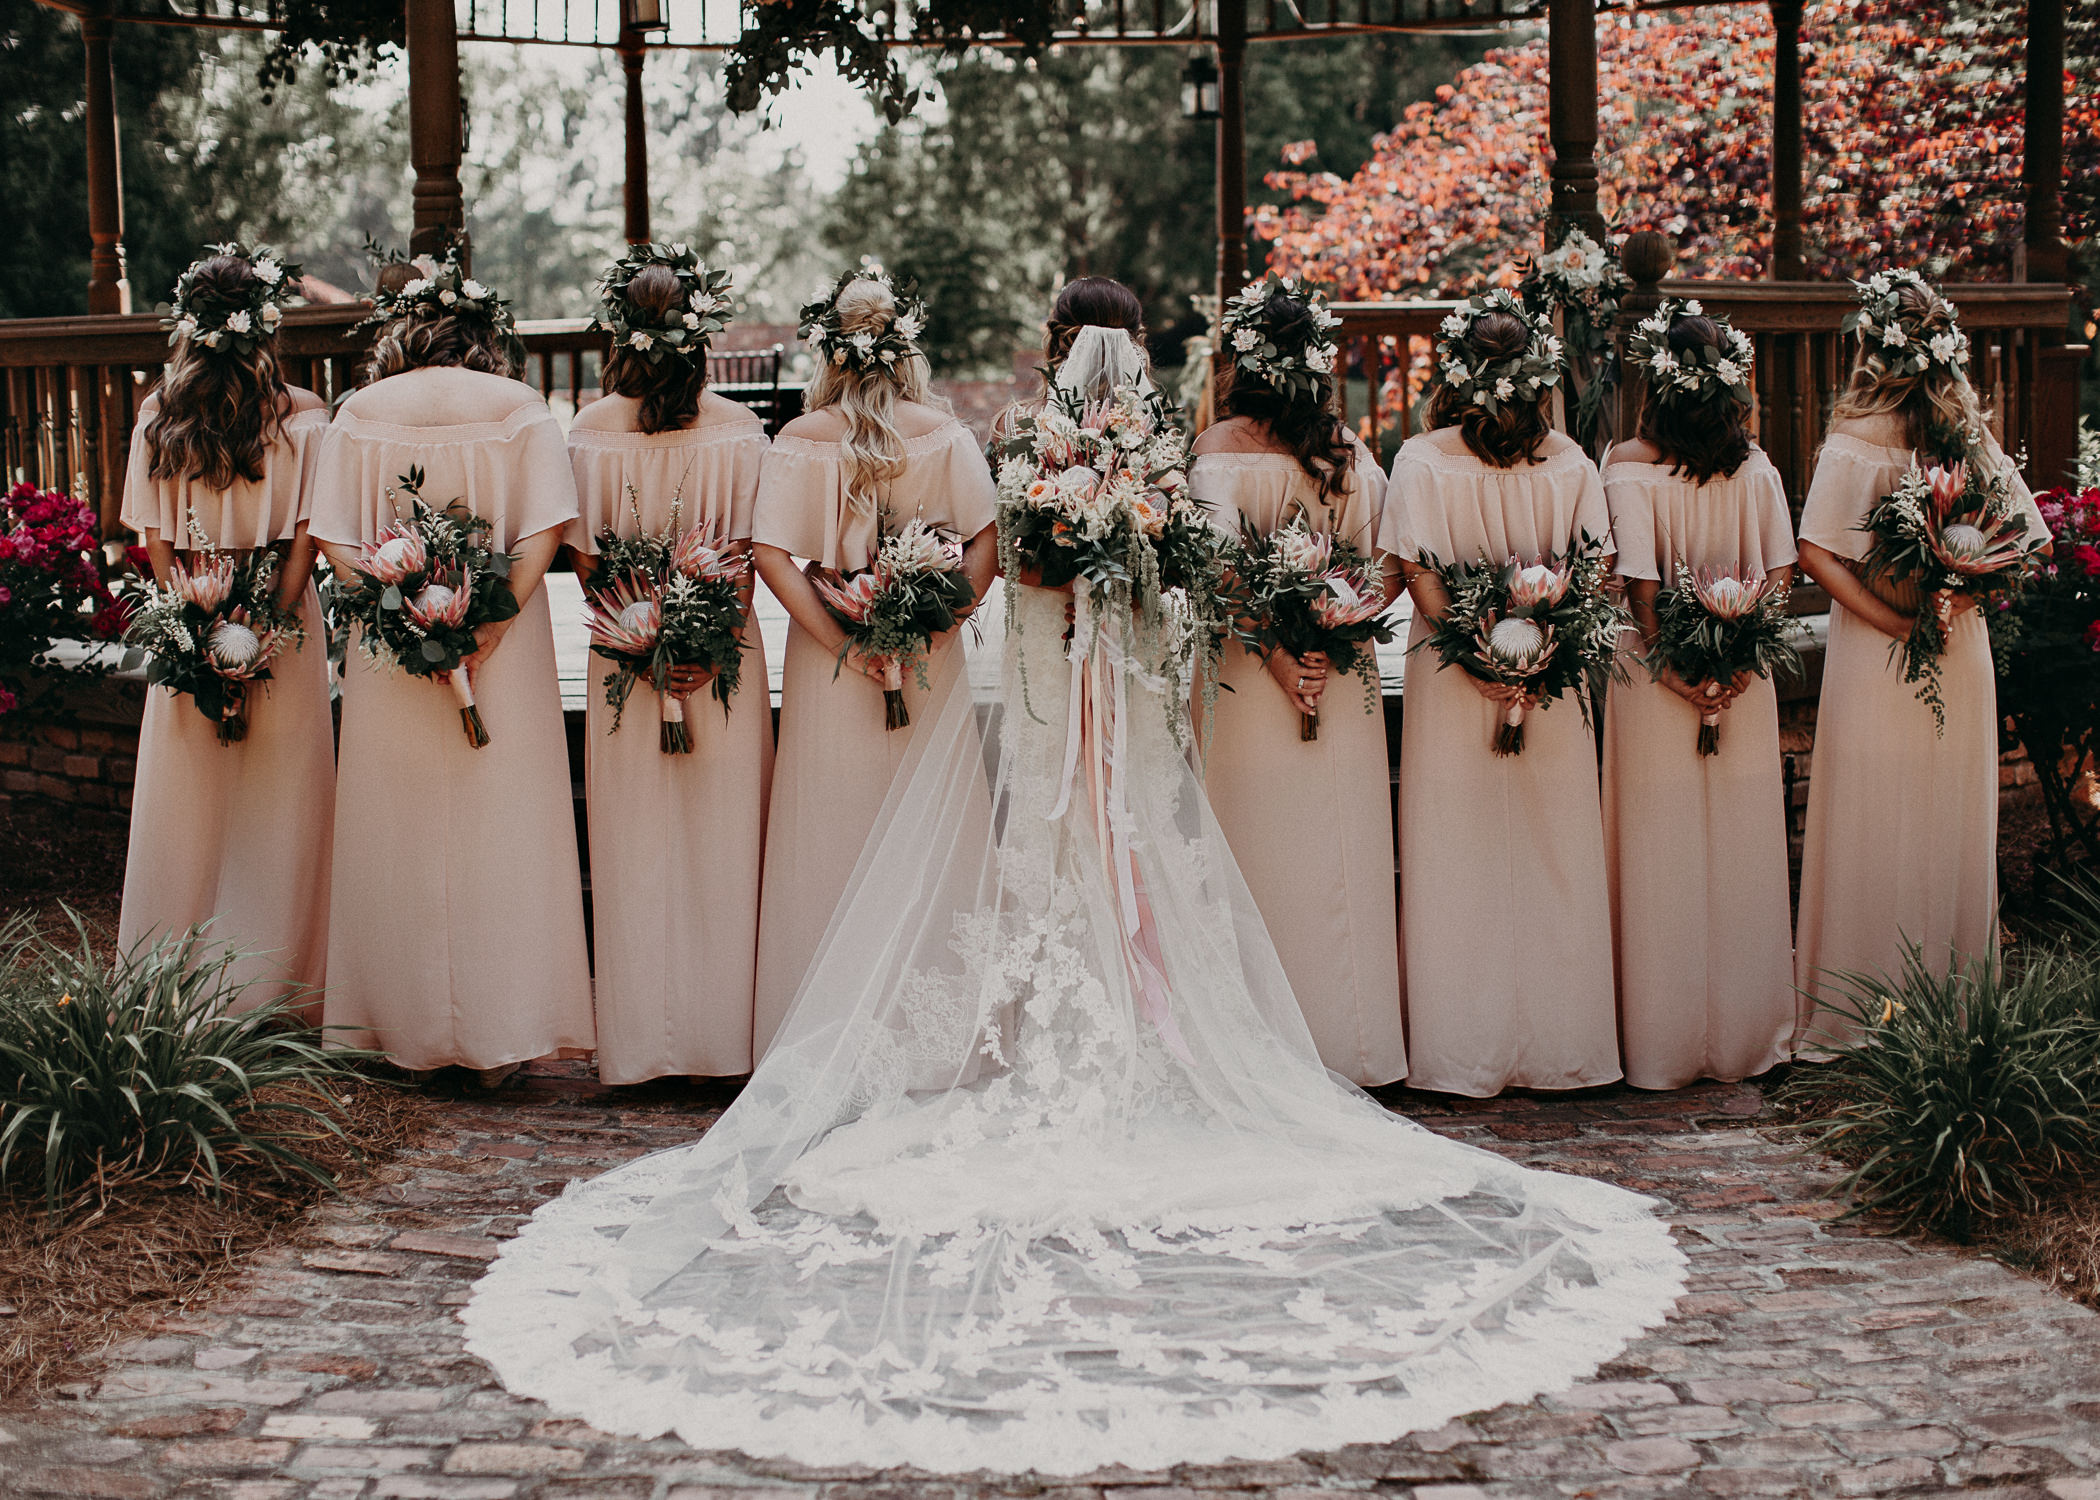 55Carl House Wedding Venue Ga, Atlanta Wedding Photographer - Boho, Bohemian, Junebug Weddings, Vintage, Retro, Trendy. Aline Marin Photography. .jpg